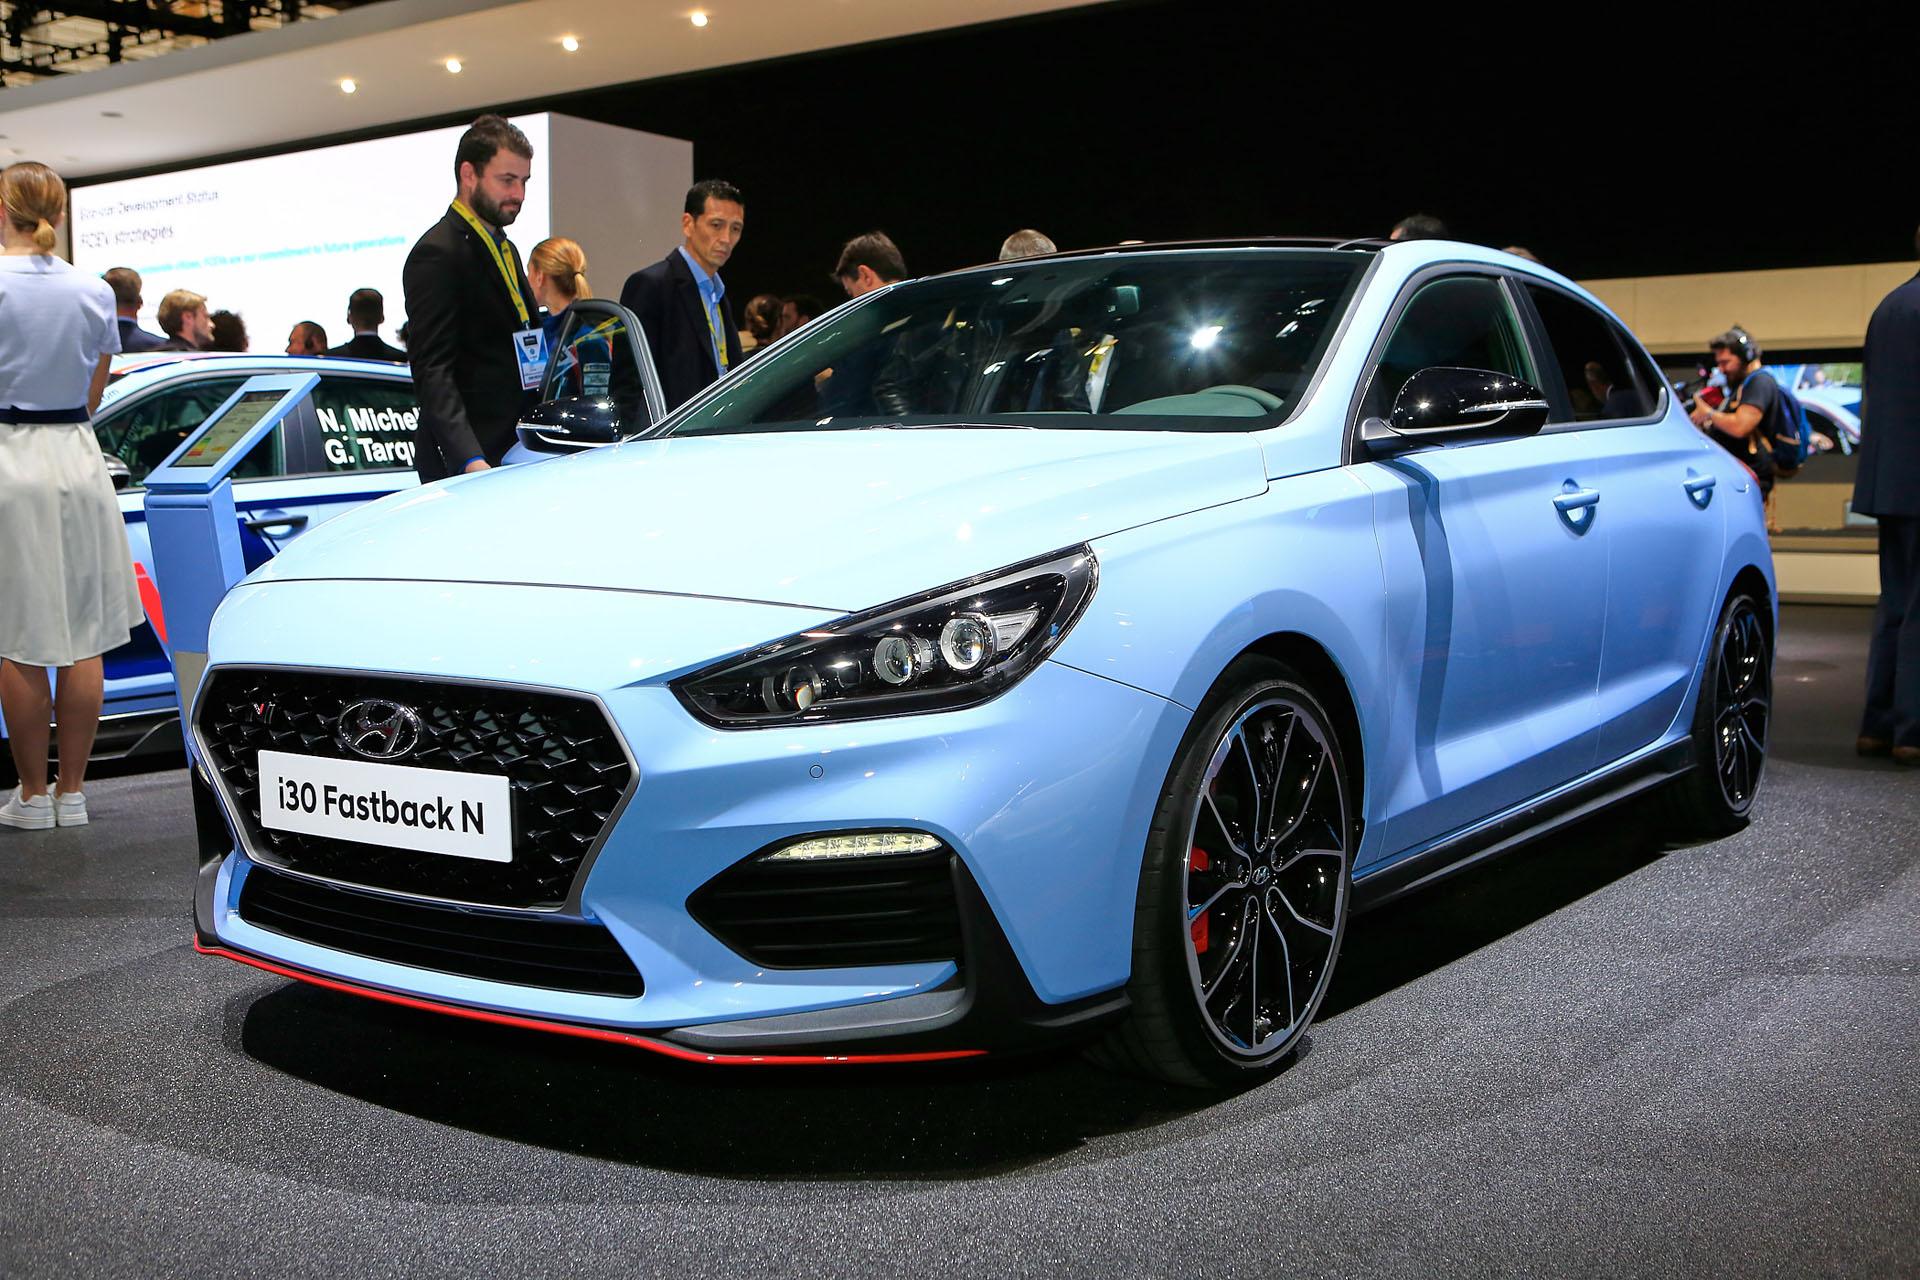 Photo of Ekonomik ve sportif: Karşınızda Hyundai i30 Fastback N!